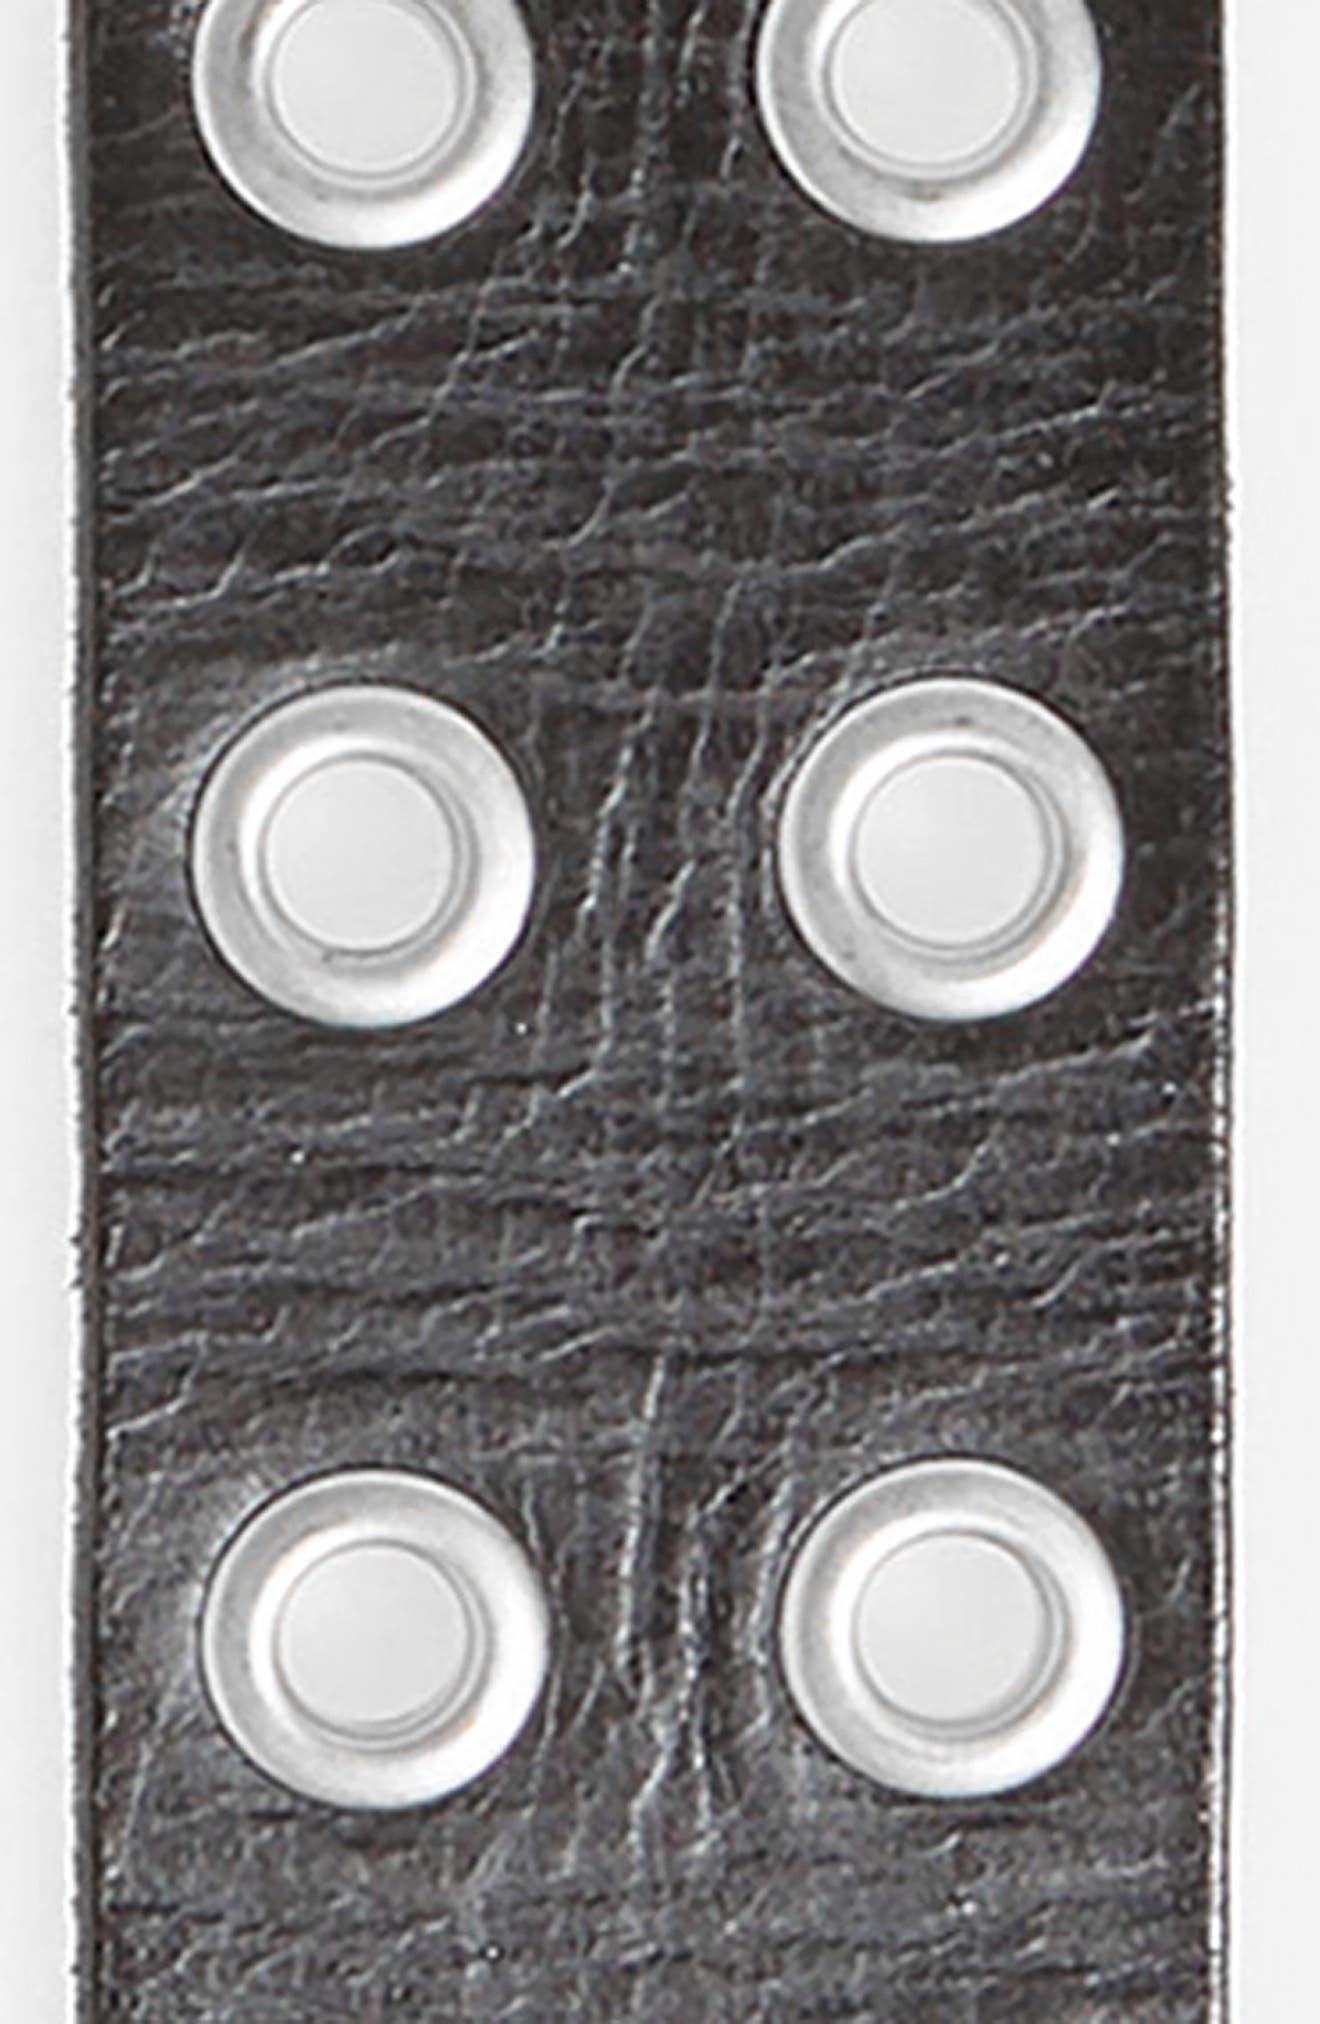 Double Prong Belt,                             Alternate thumbnail 3, color,                             BLACK/ DULL NICKEL